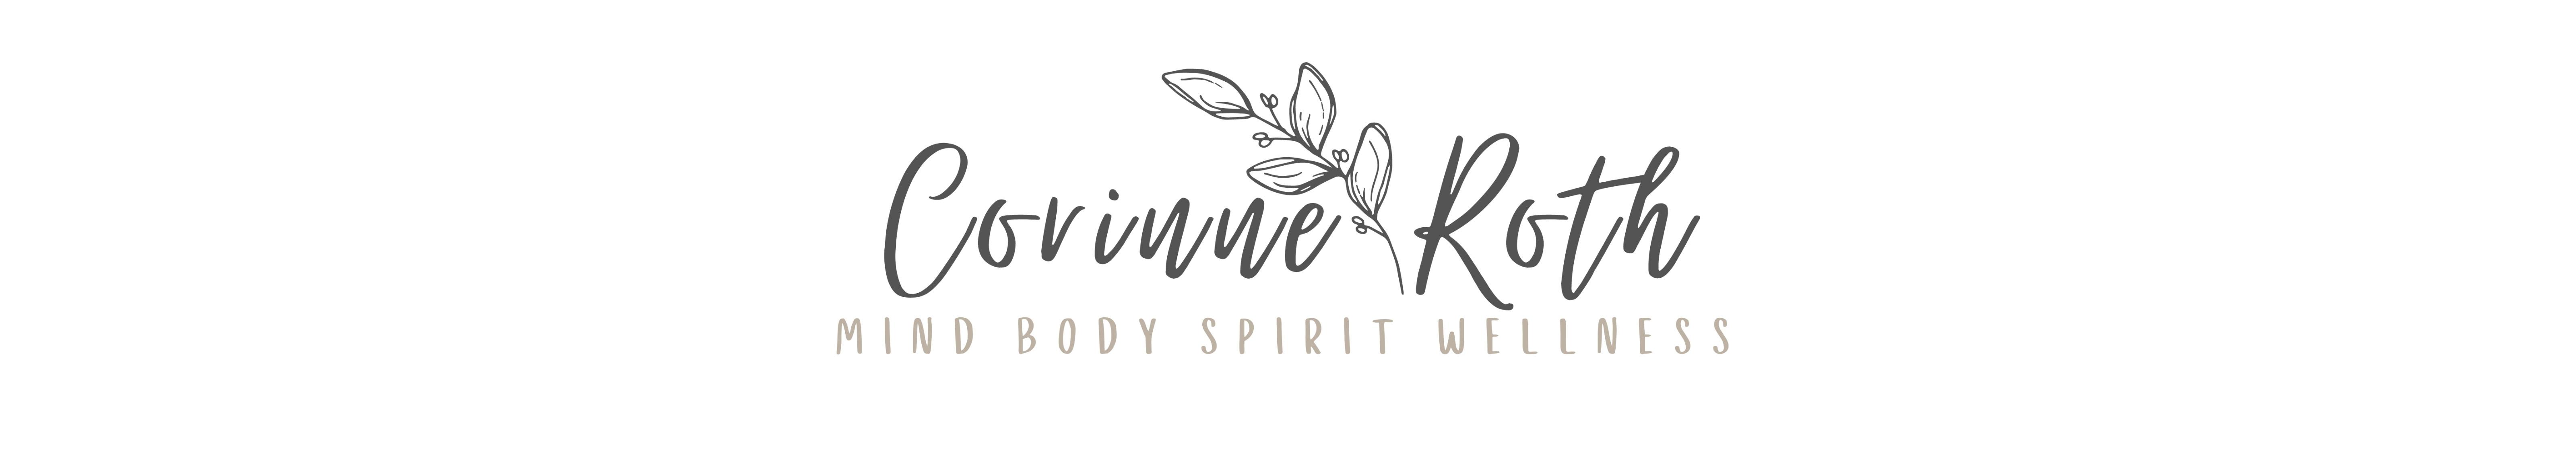 Corinne Roth Wellness